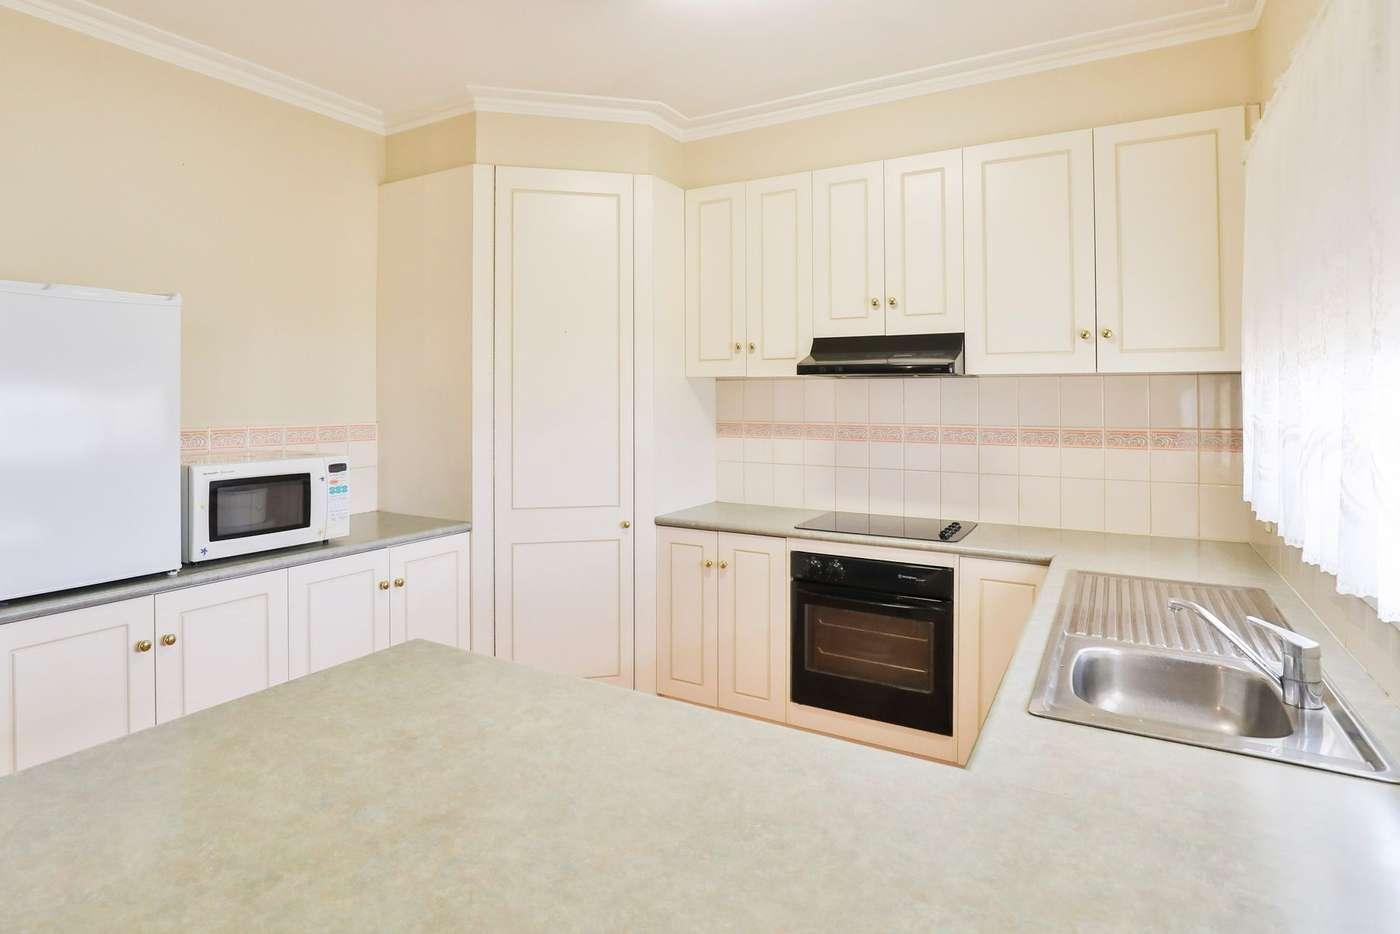 Sixth view of Homely house listing, 2 Plane Tree Drive, Mildura VIC 3500